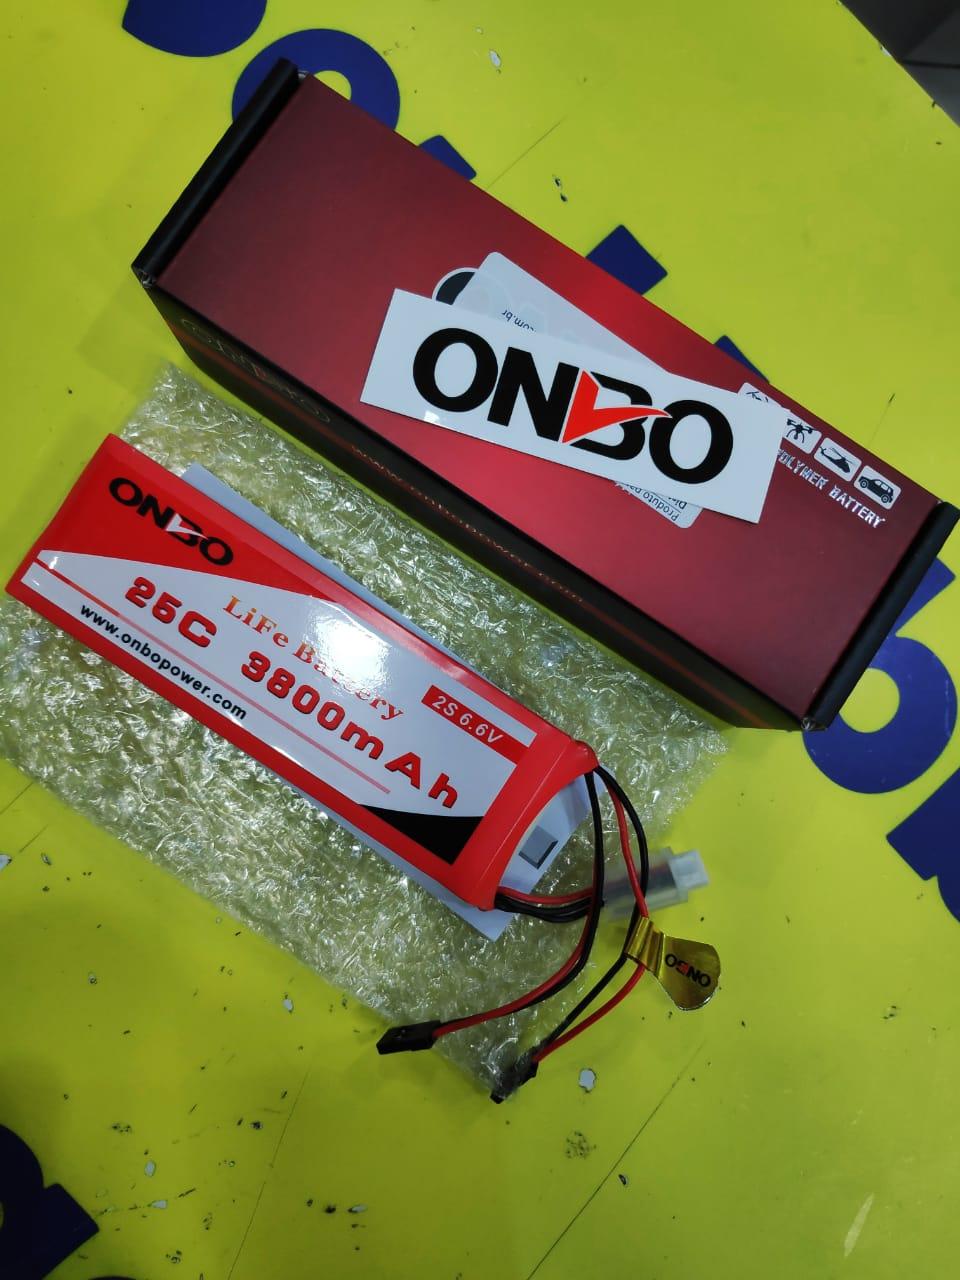 ONBO - BATERIA ONBO LIFE 6,6V 3800MAH